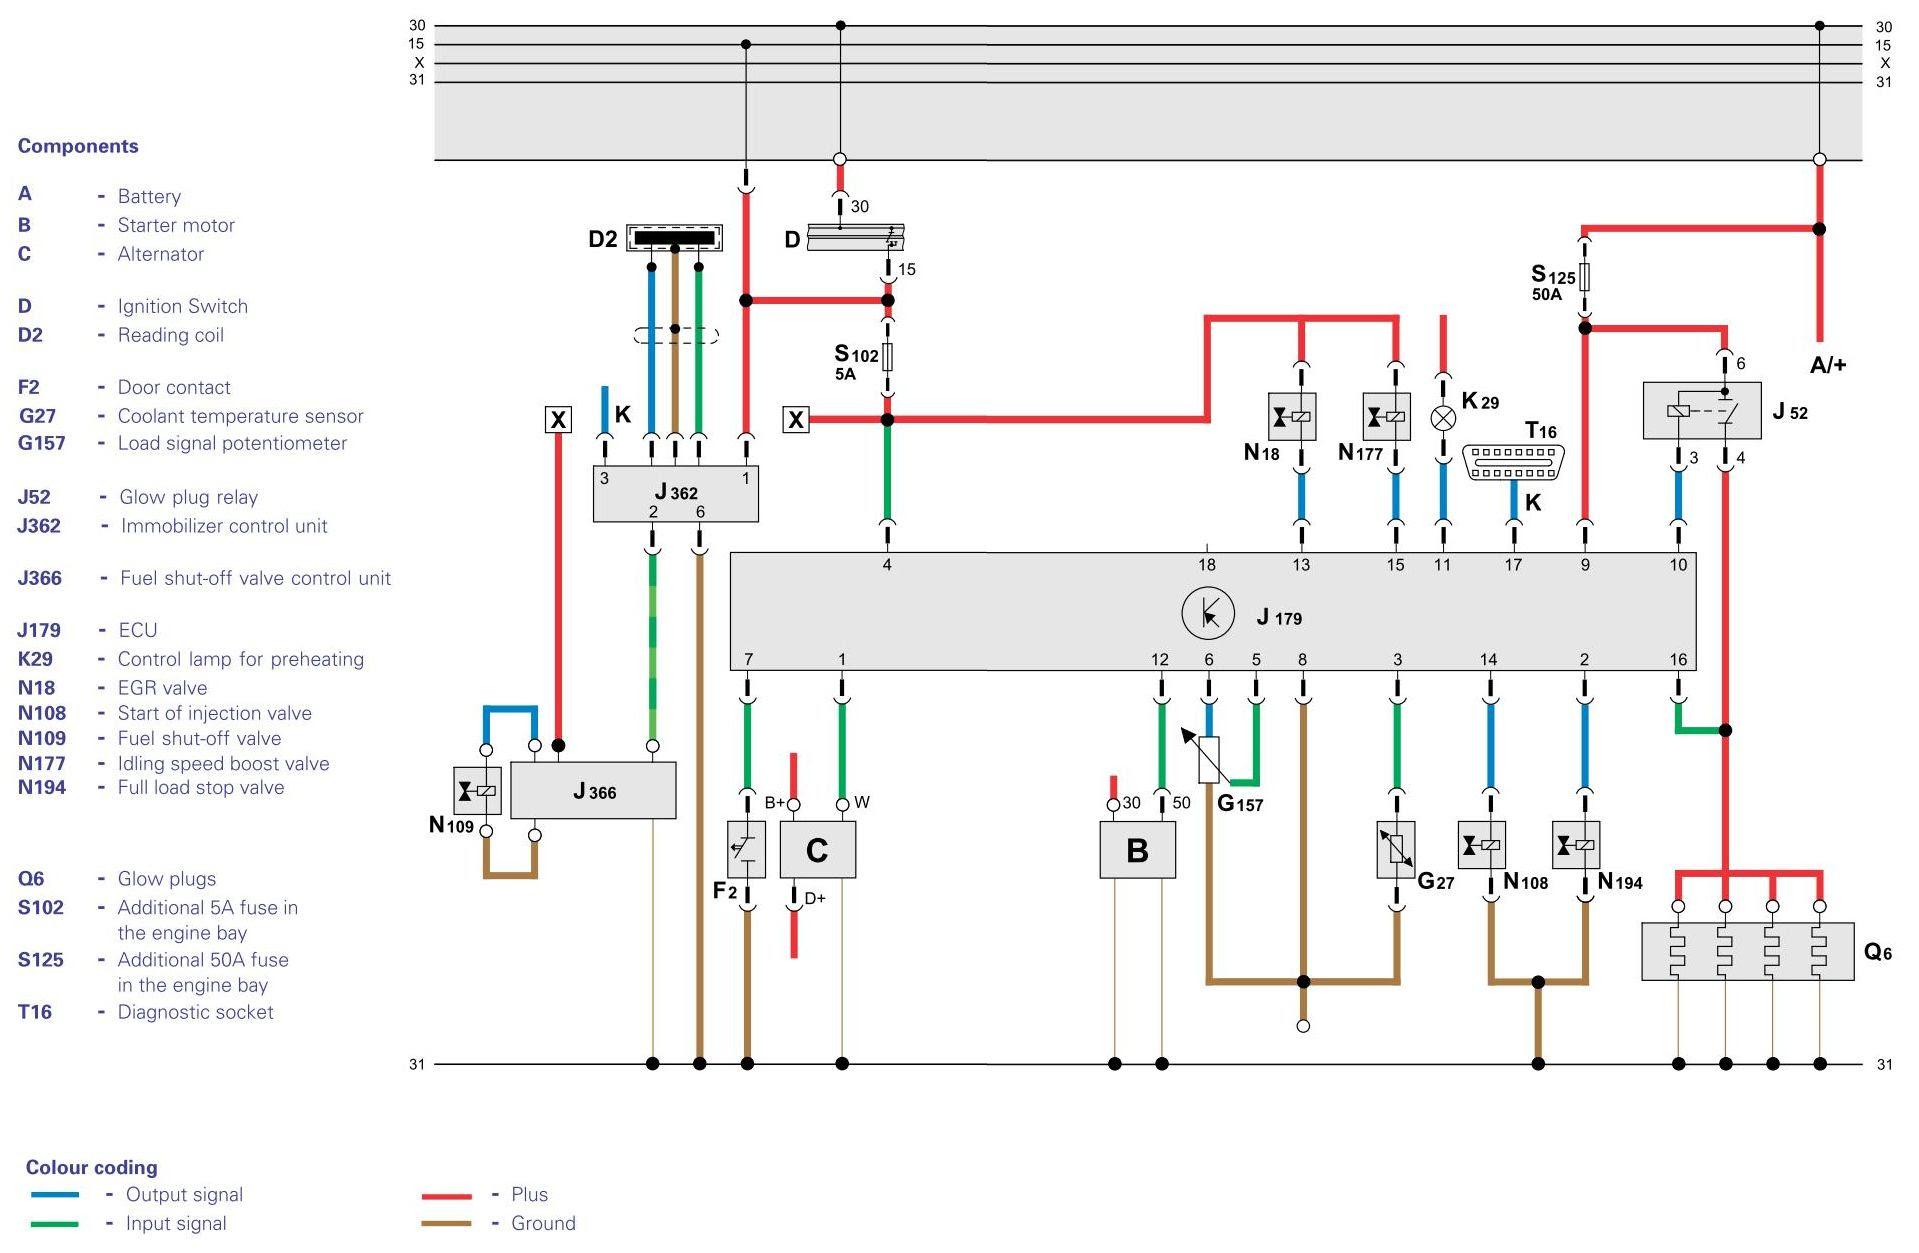 Annunciator Panel Wiring Diagram